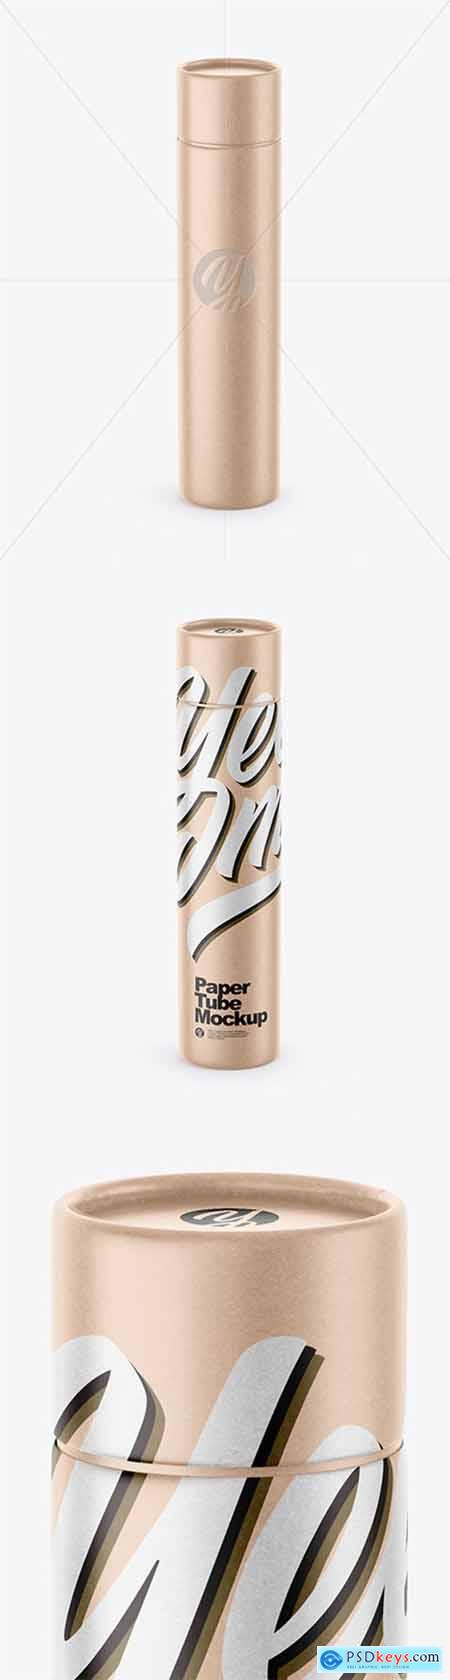 Kraft Paper Tube Mockup 55447